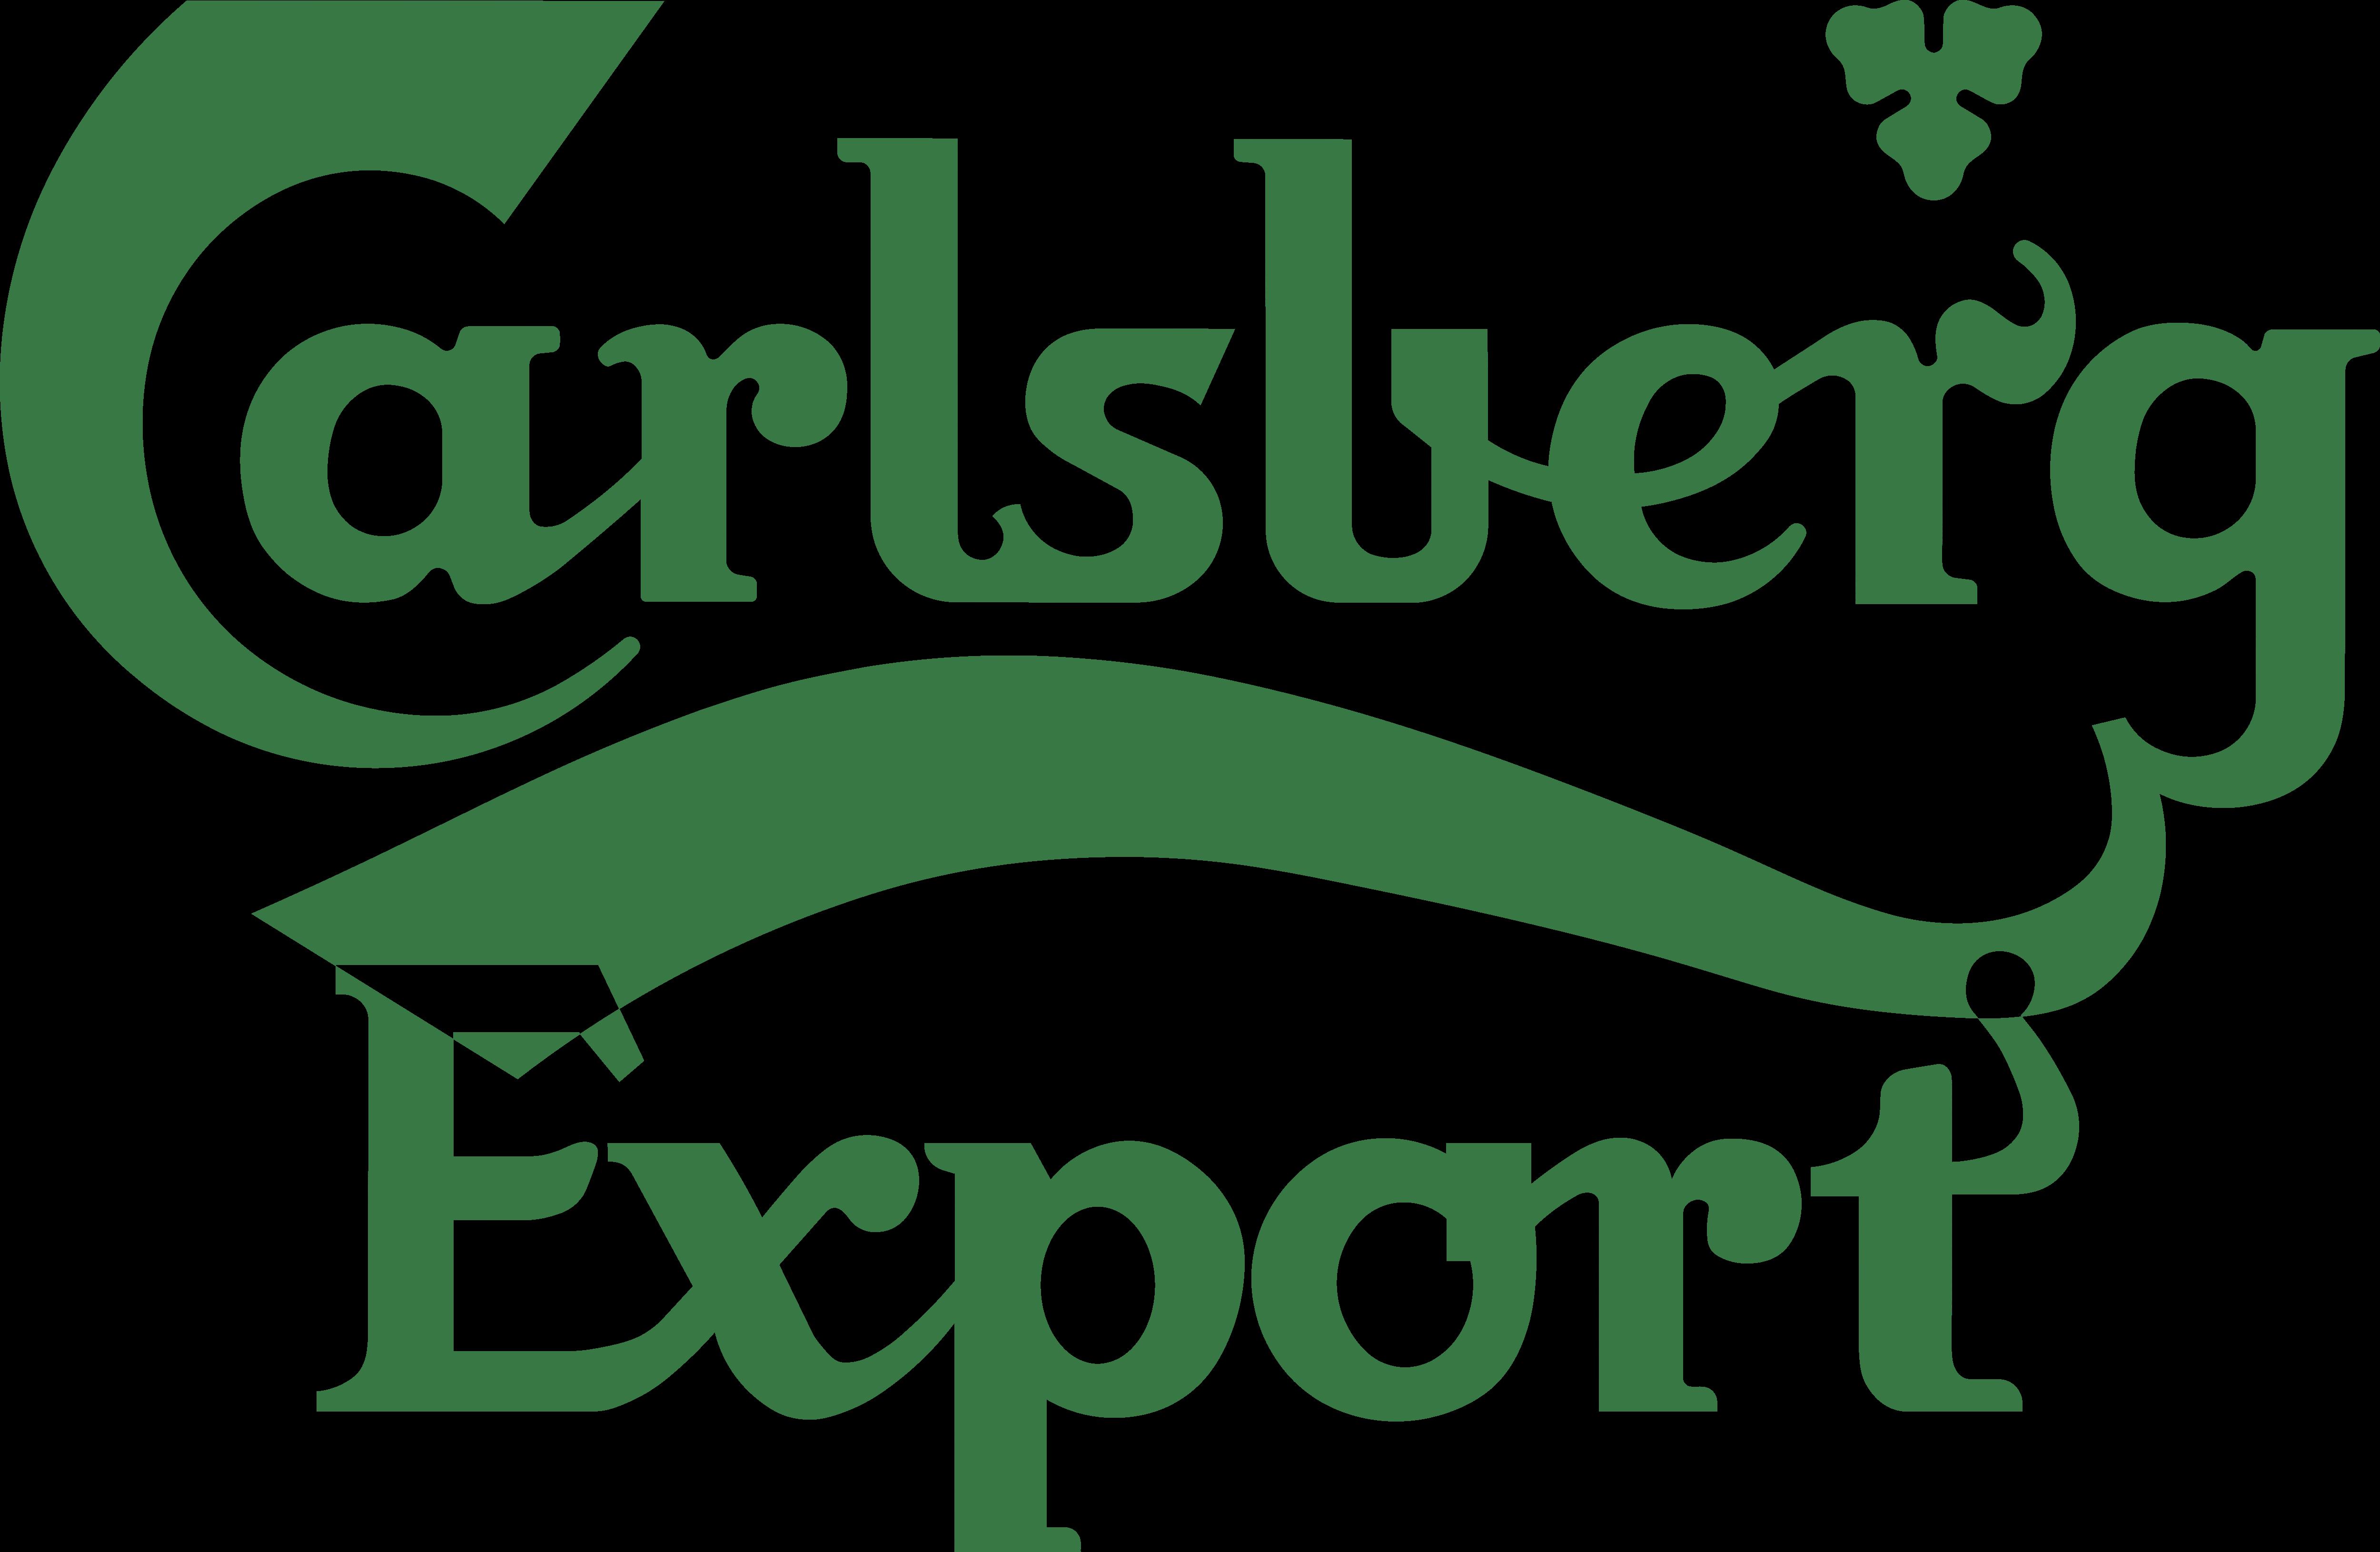 Carlsberg – Logos Download - Carlsberg, Transparent background PNG HD thumbnail